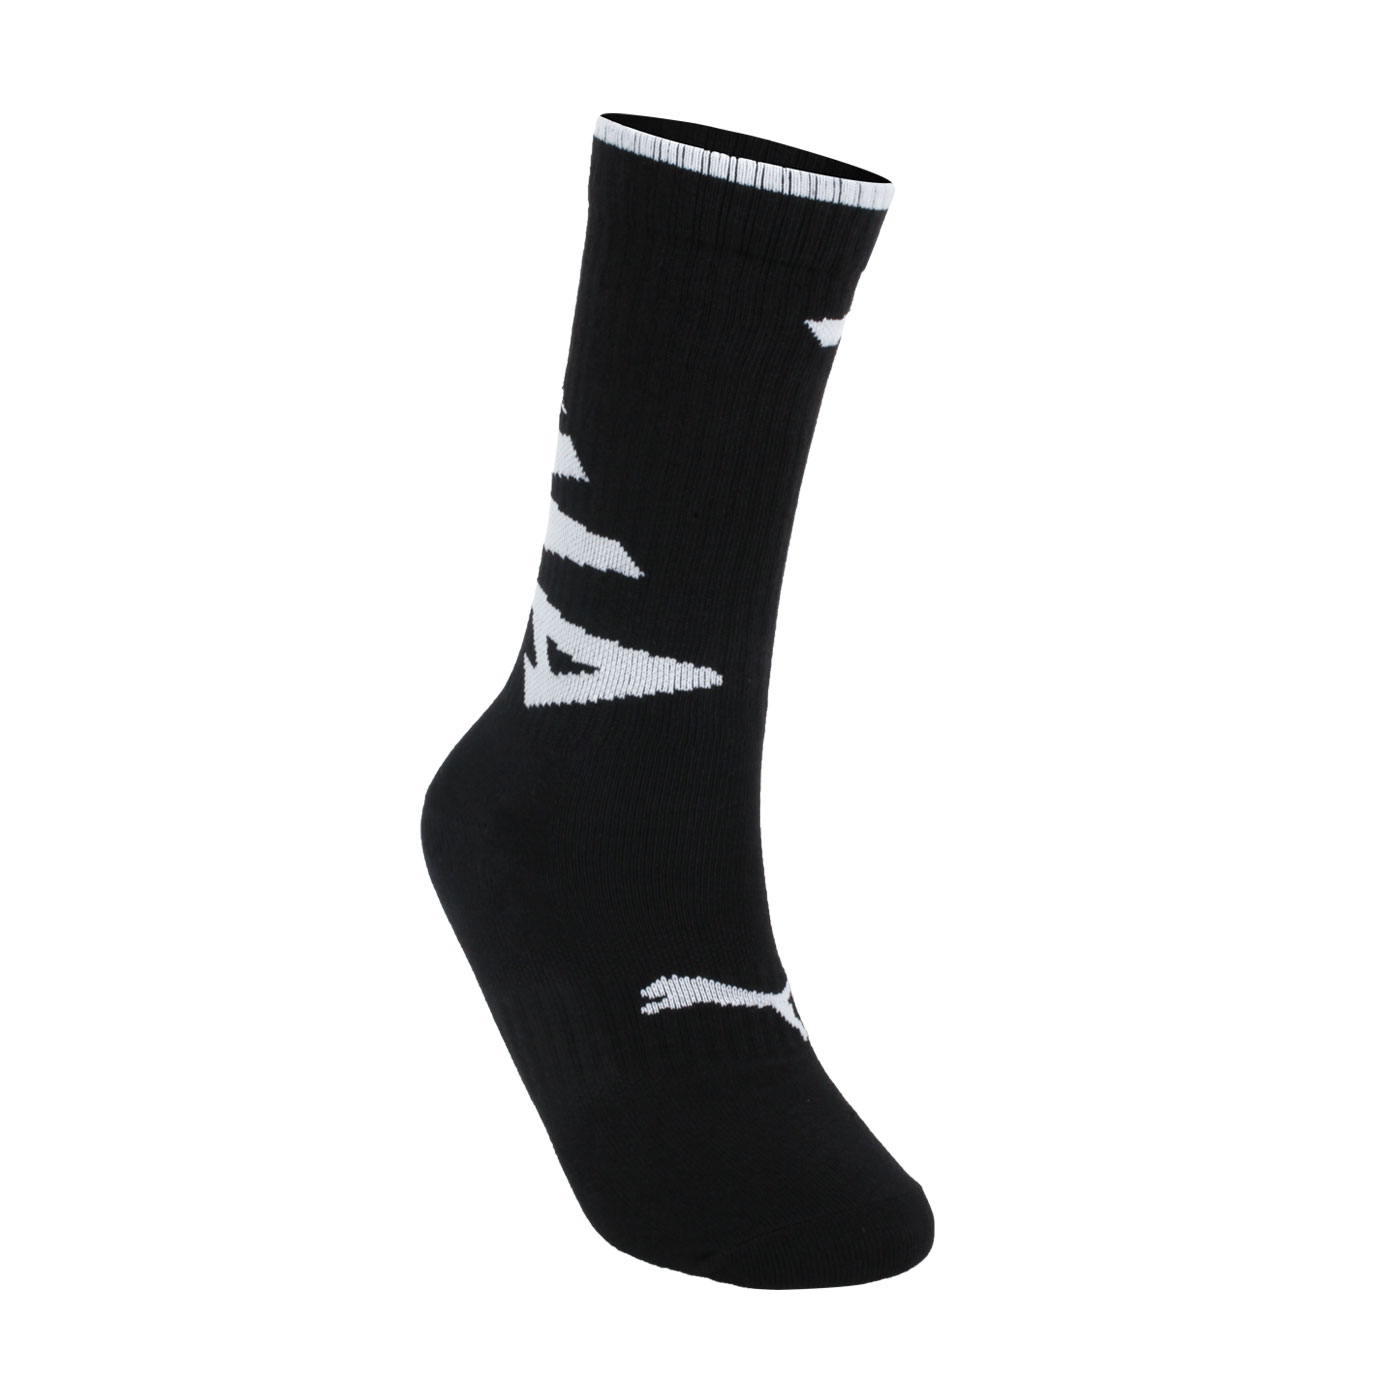 PUMA Fashion斜體半統襪 BB115201 - 黑白